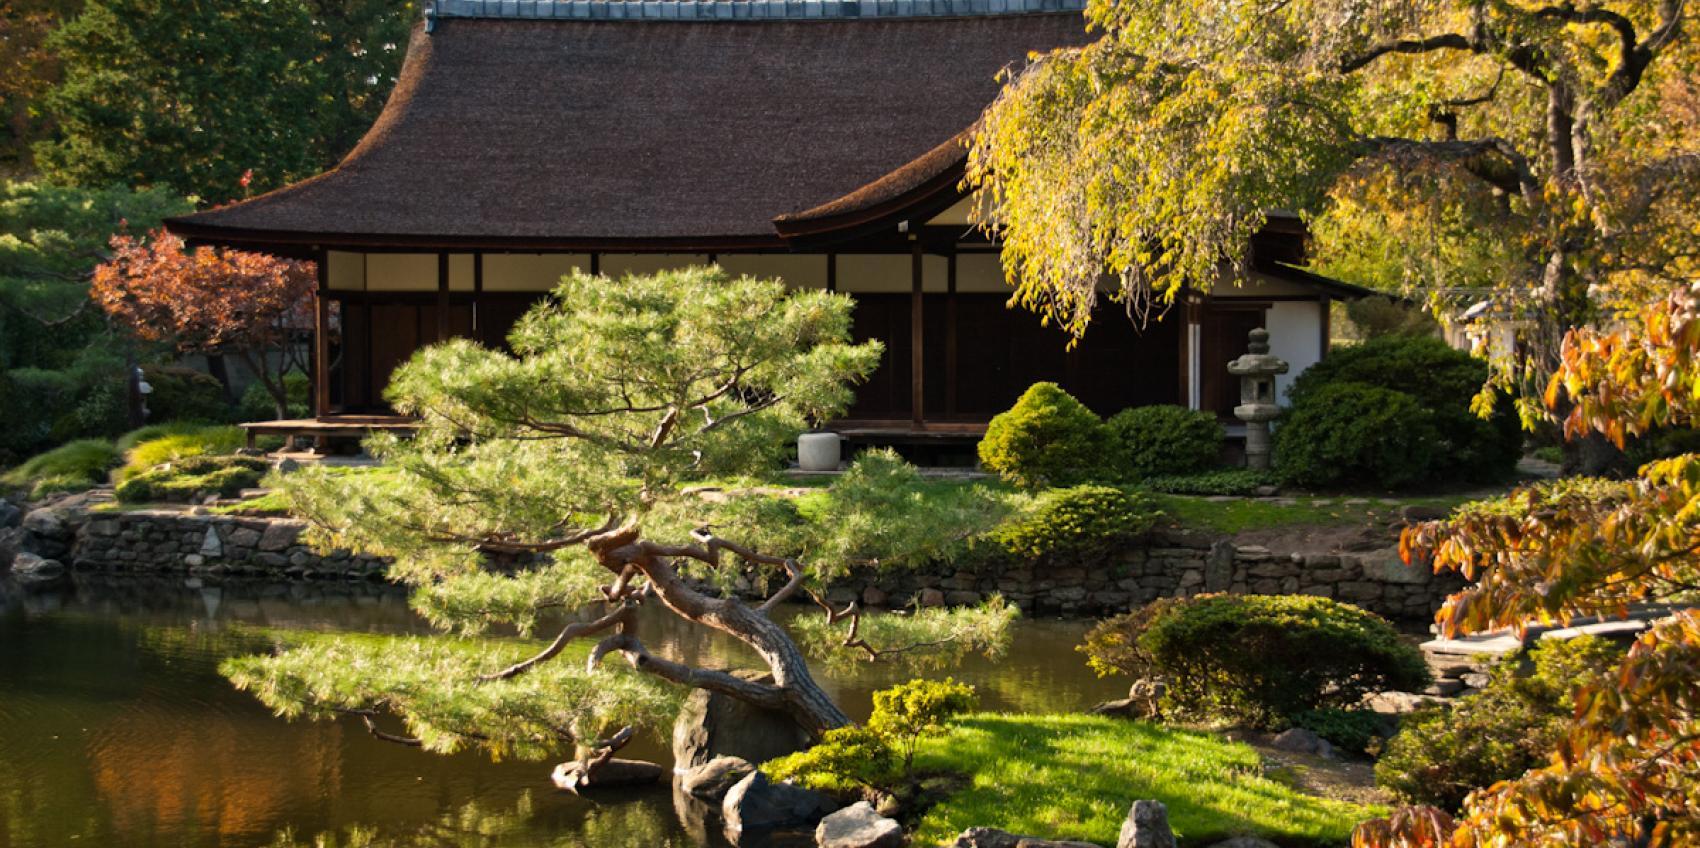 Shofuso Japanese House And Garden | American Public Gardens Association